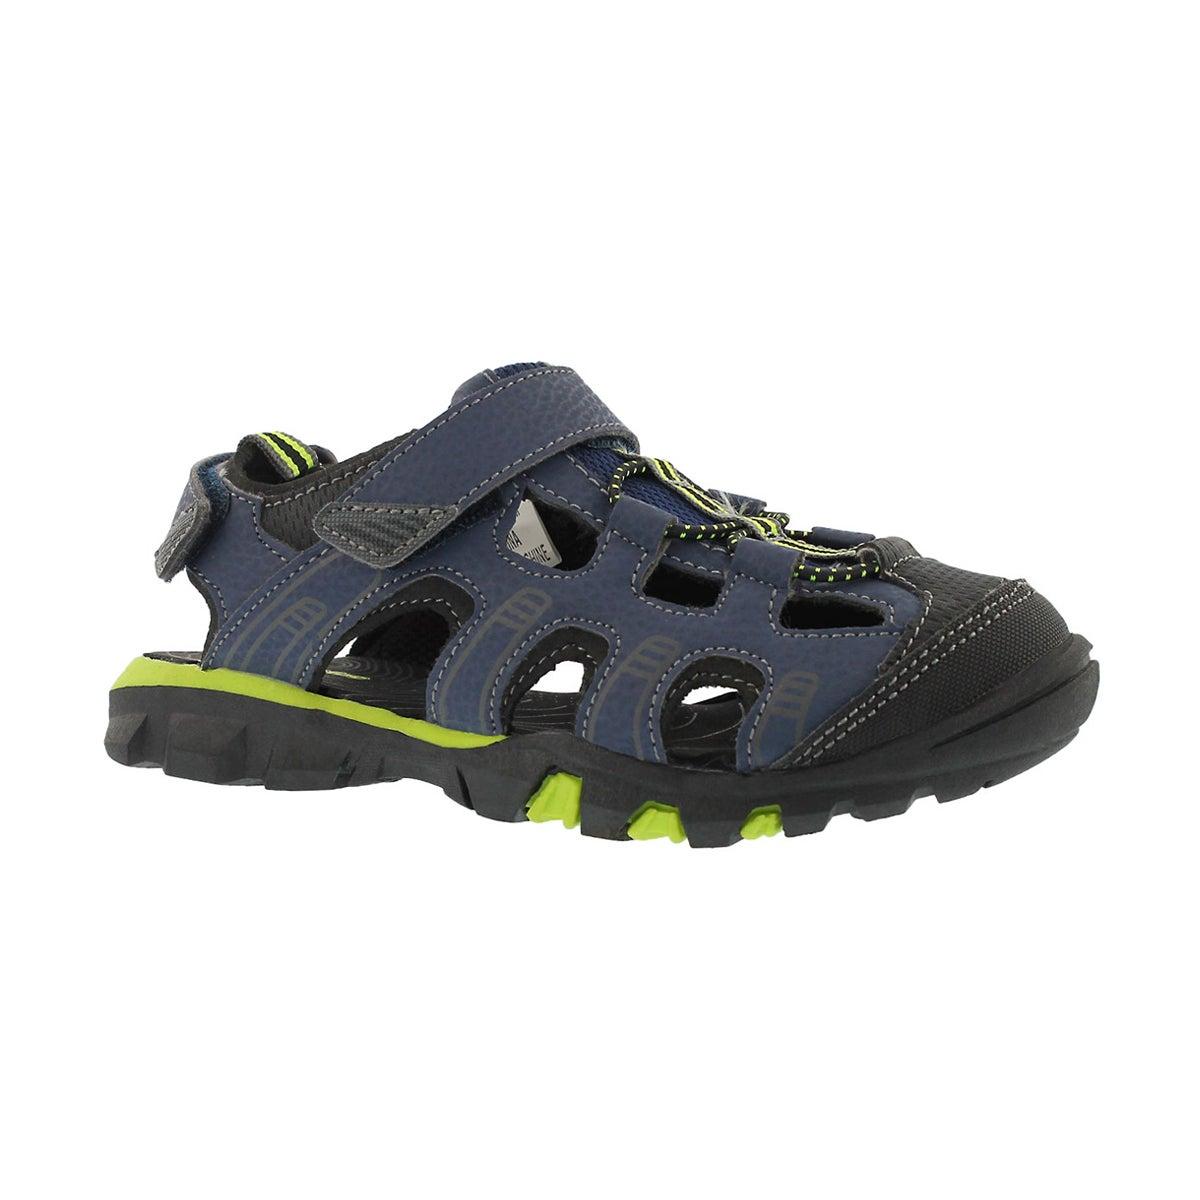 Boys' ELLIOT 2 navy closed toe sandals